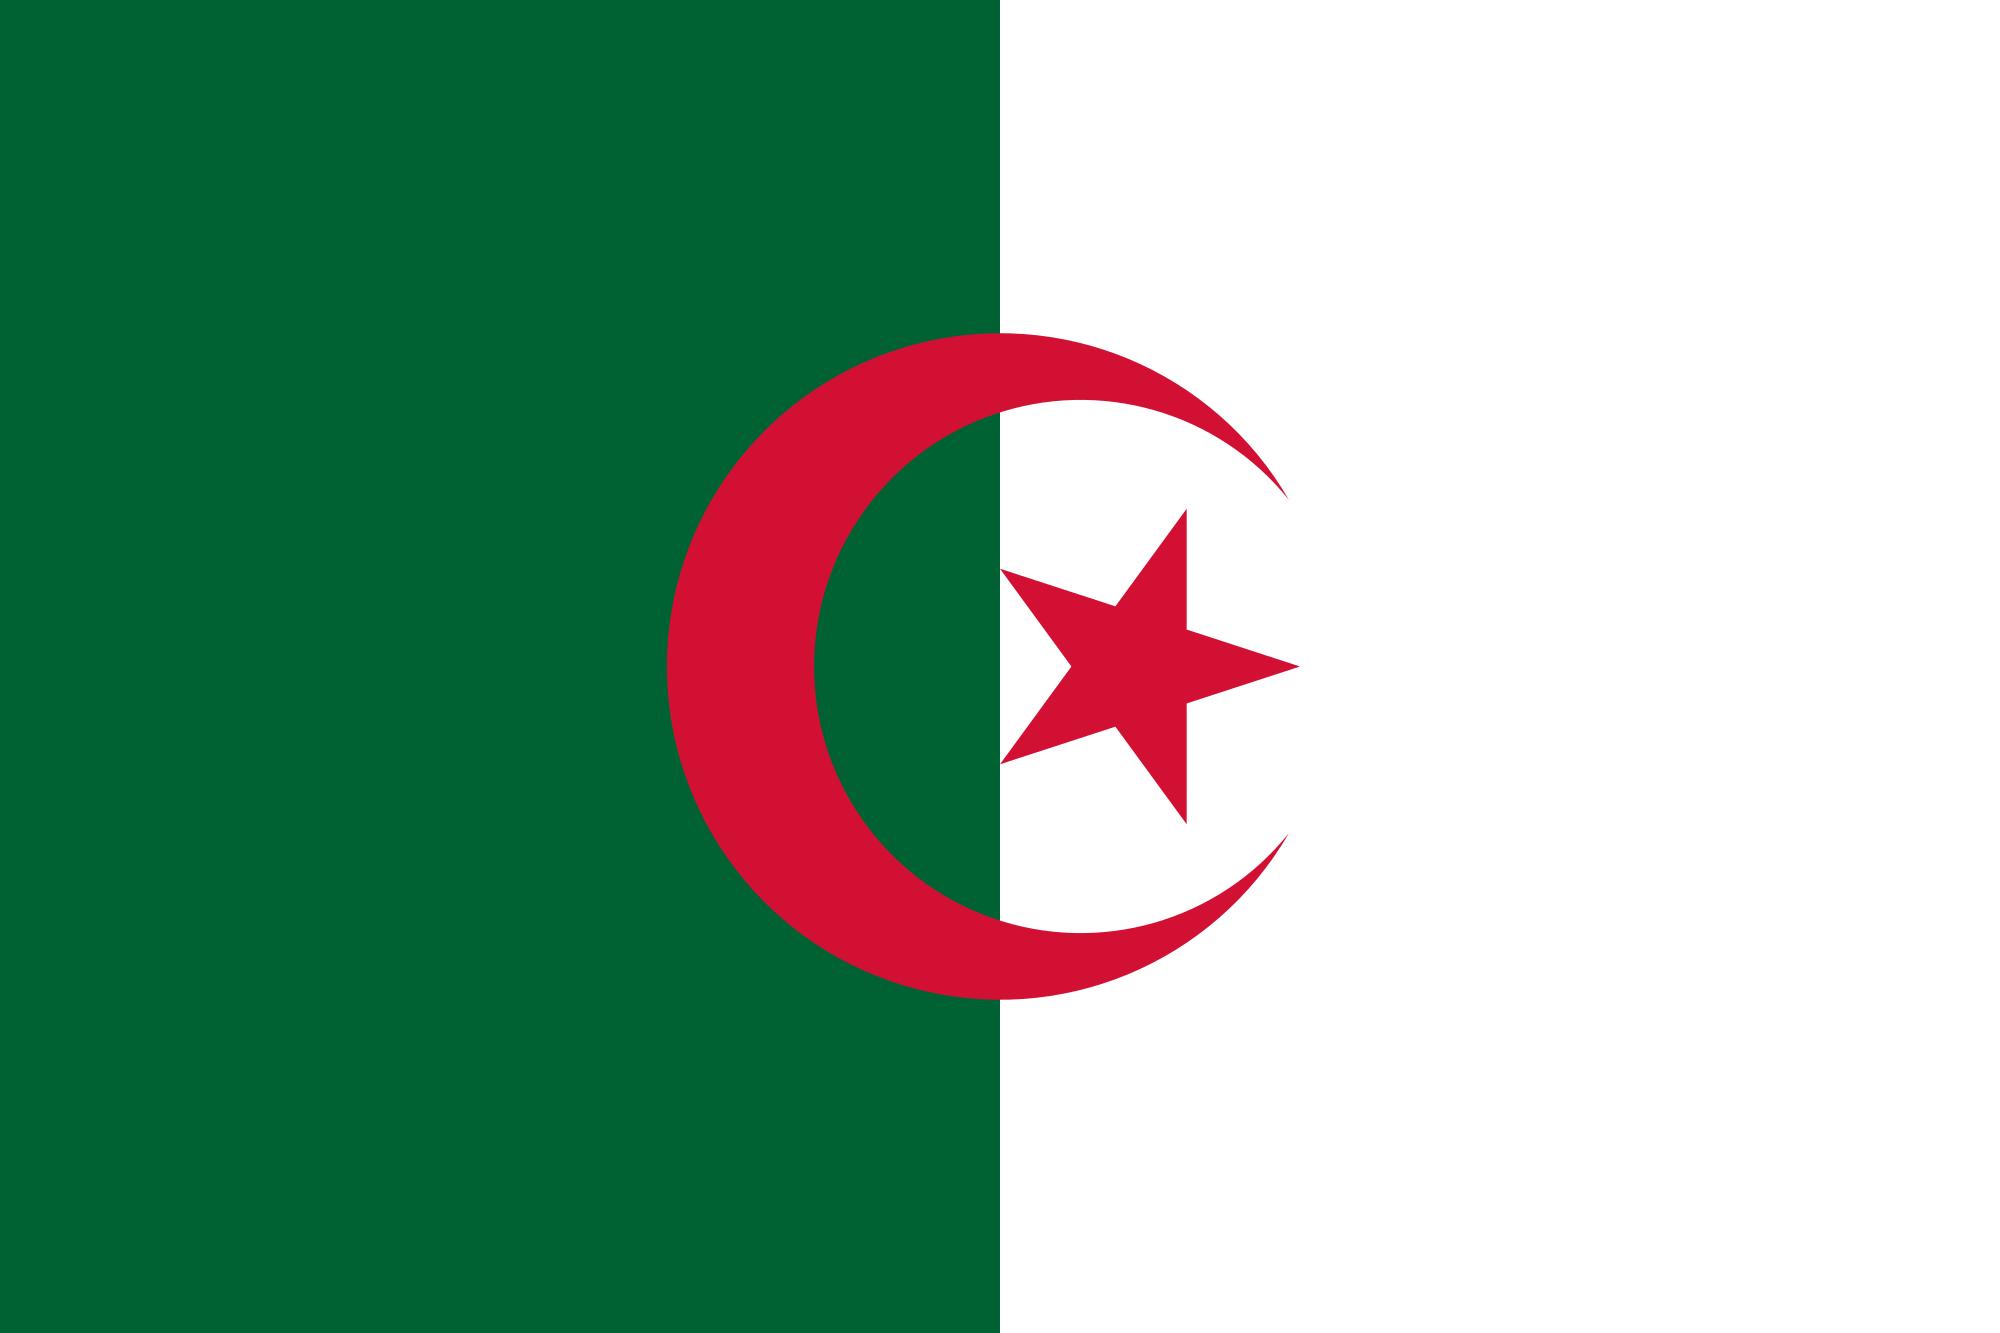 bandiera d'Algeria